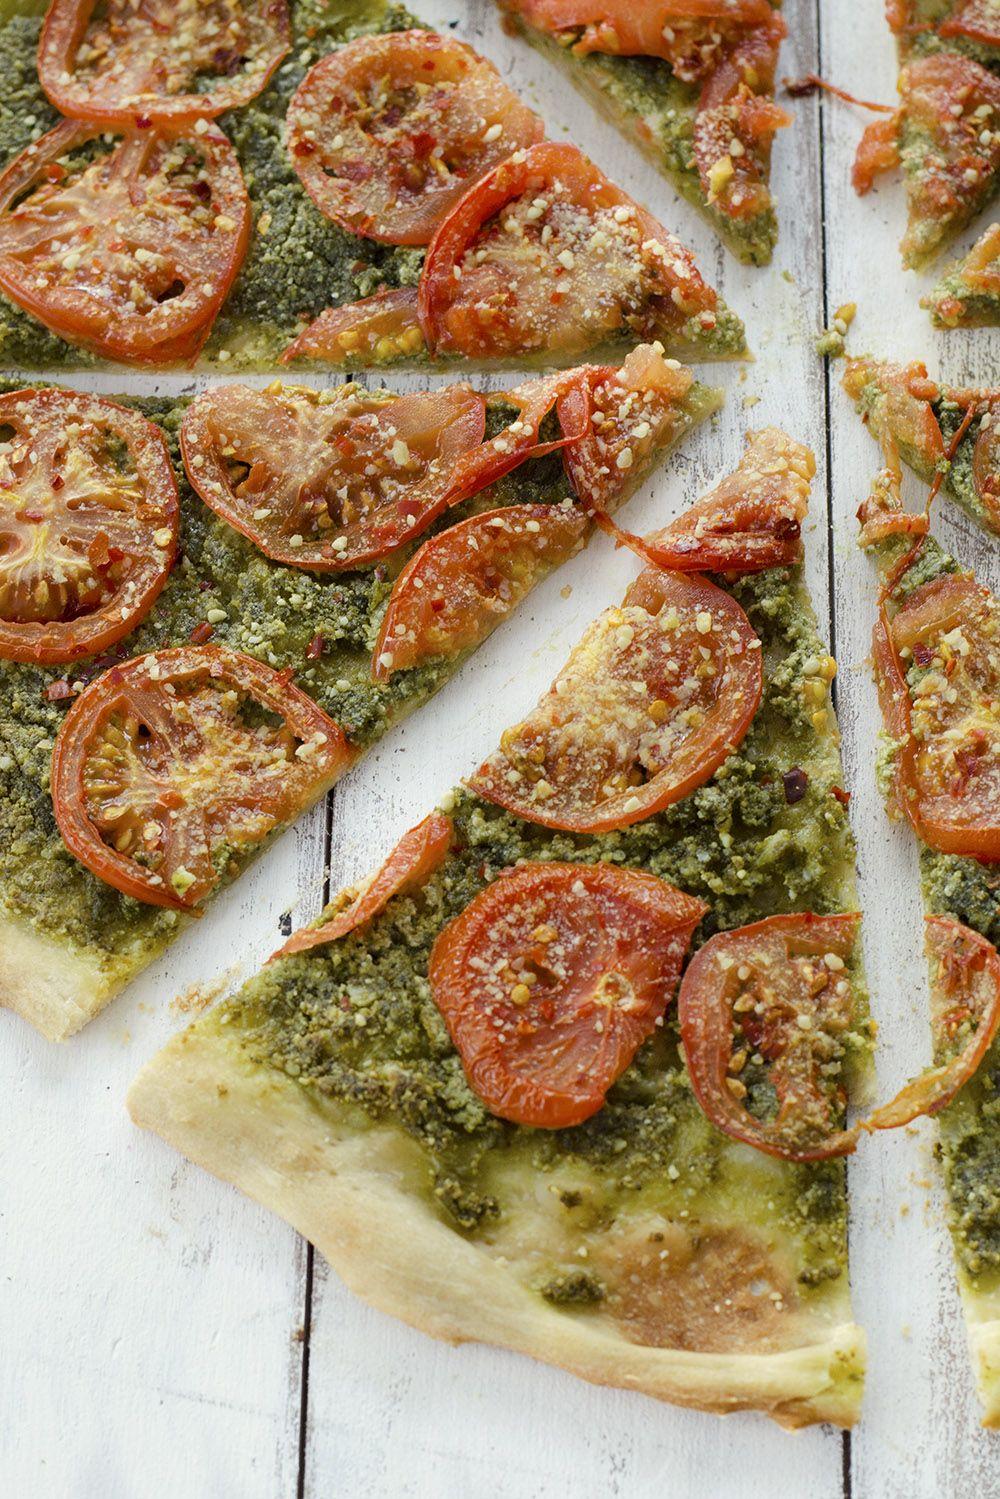 Vegan Pesto and Roasted Tomato Pizza + Video - Delish Knowledge